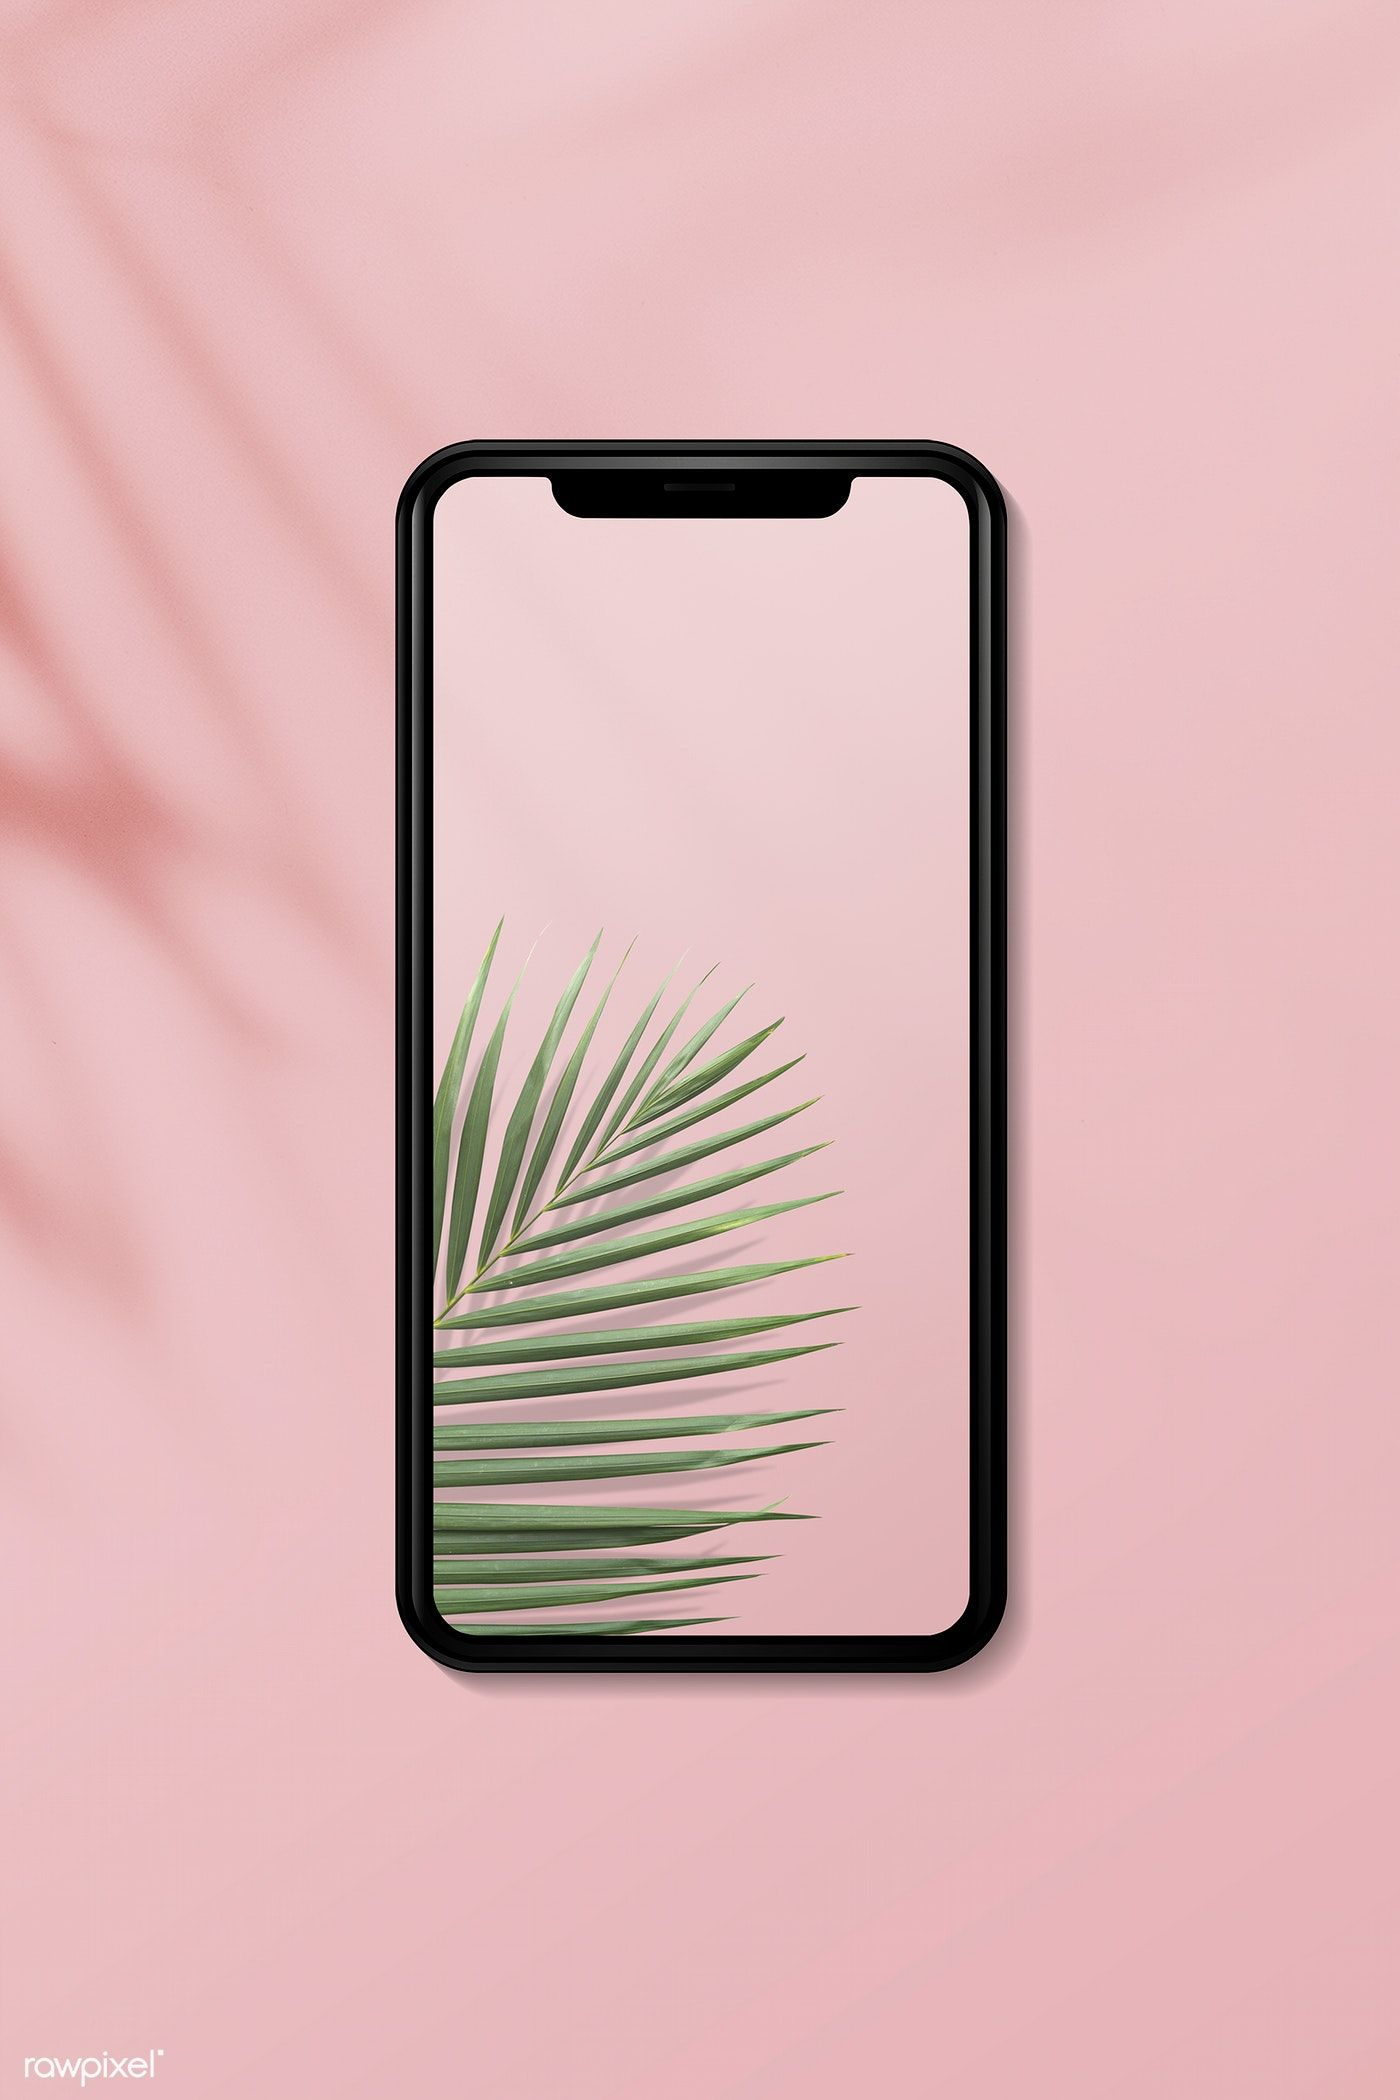 Download Premium Psd Of Blank Smartphone Screen Mockup Design